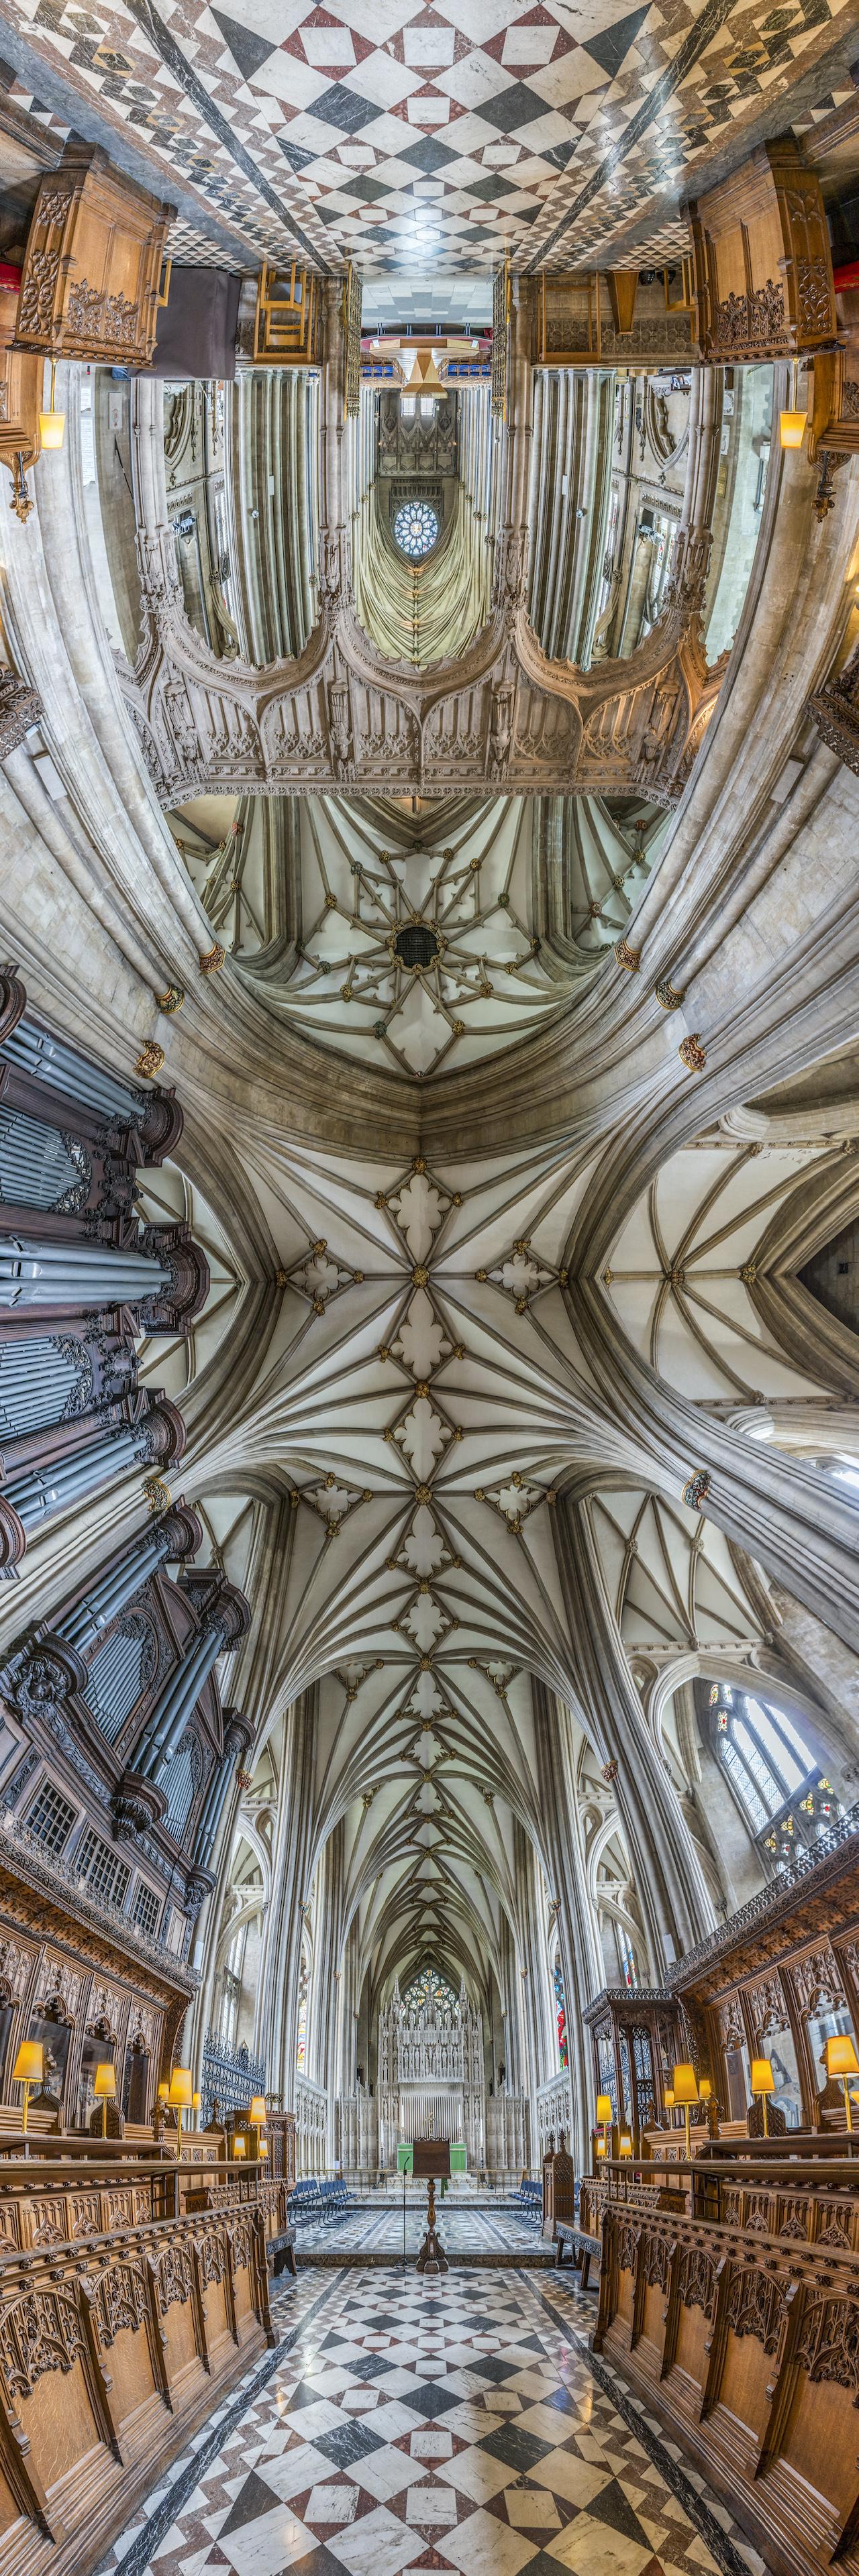 Richard Silver, Bristol Cathedral in Bristol, England